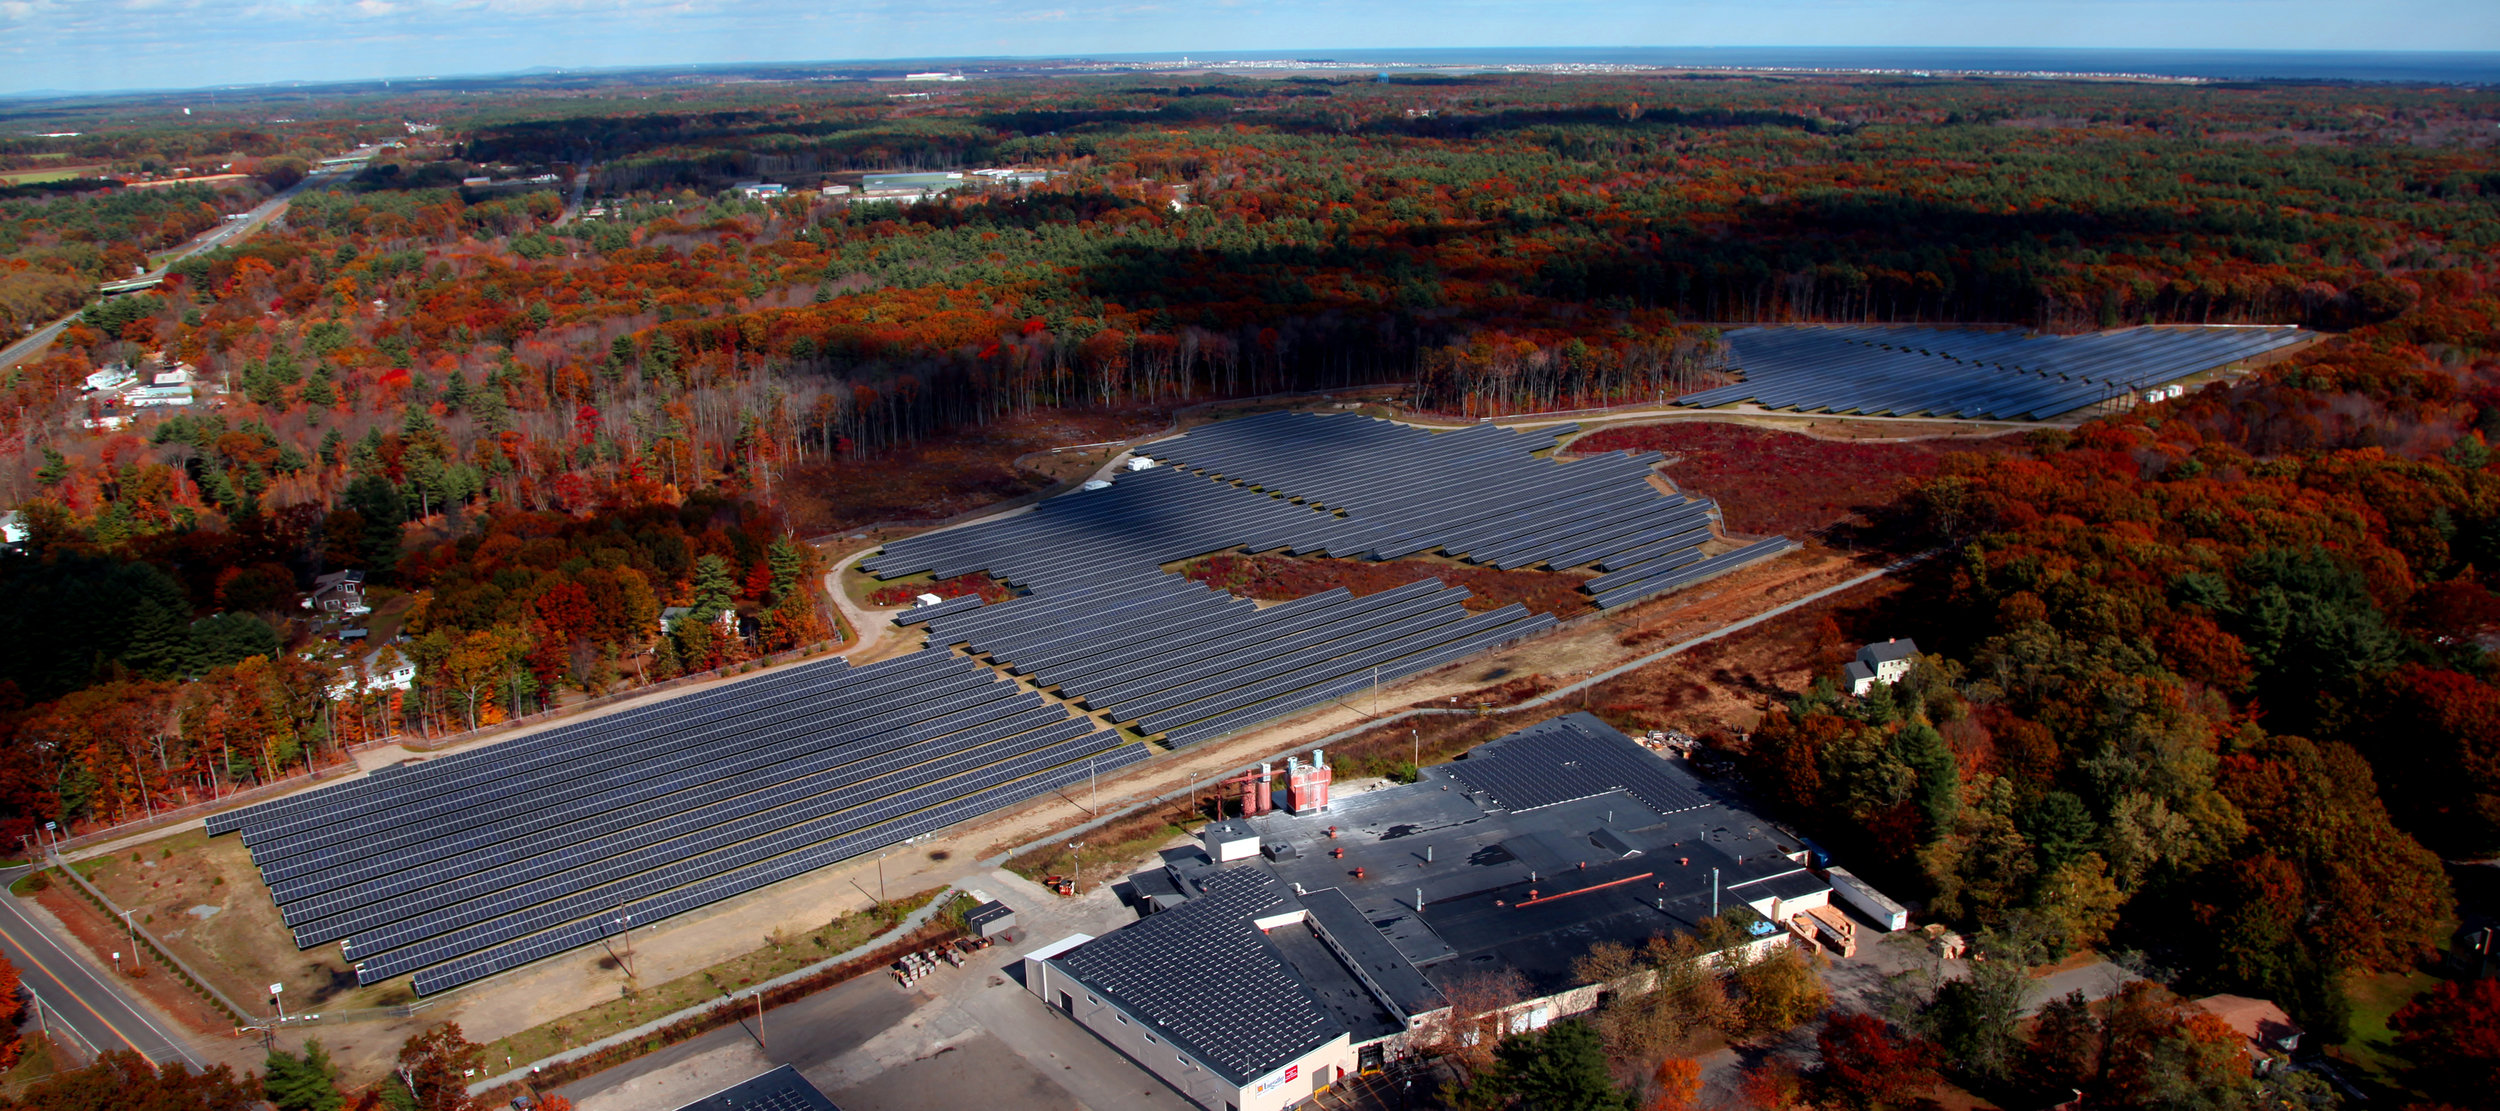 True North - 5.7 MW DC